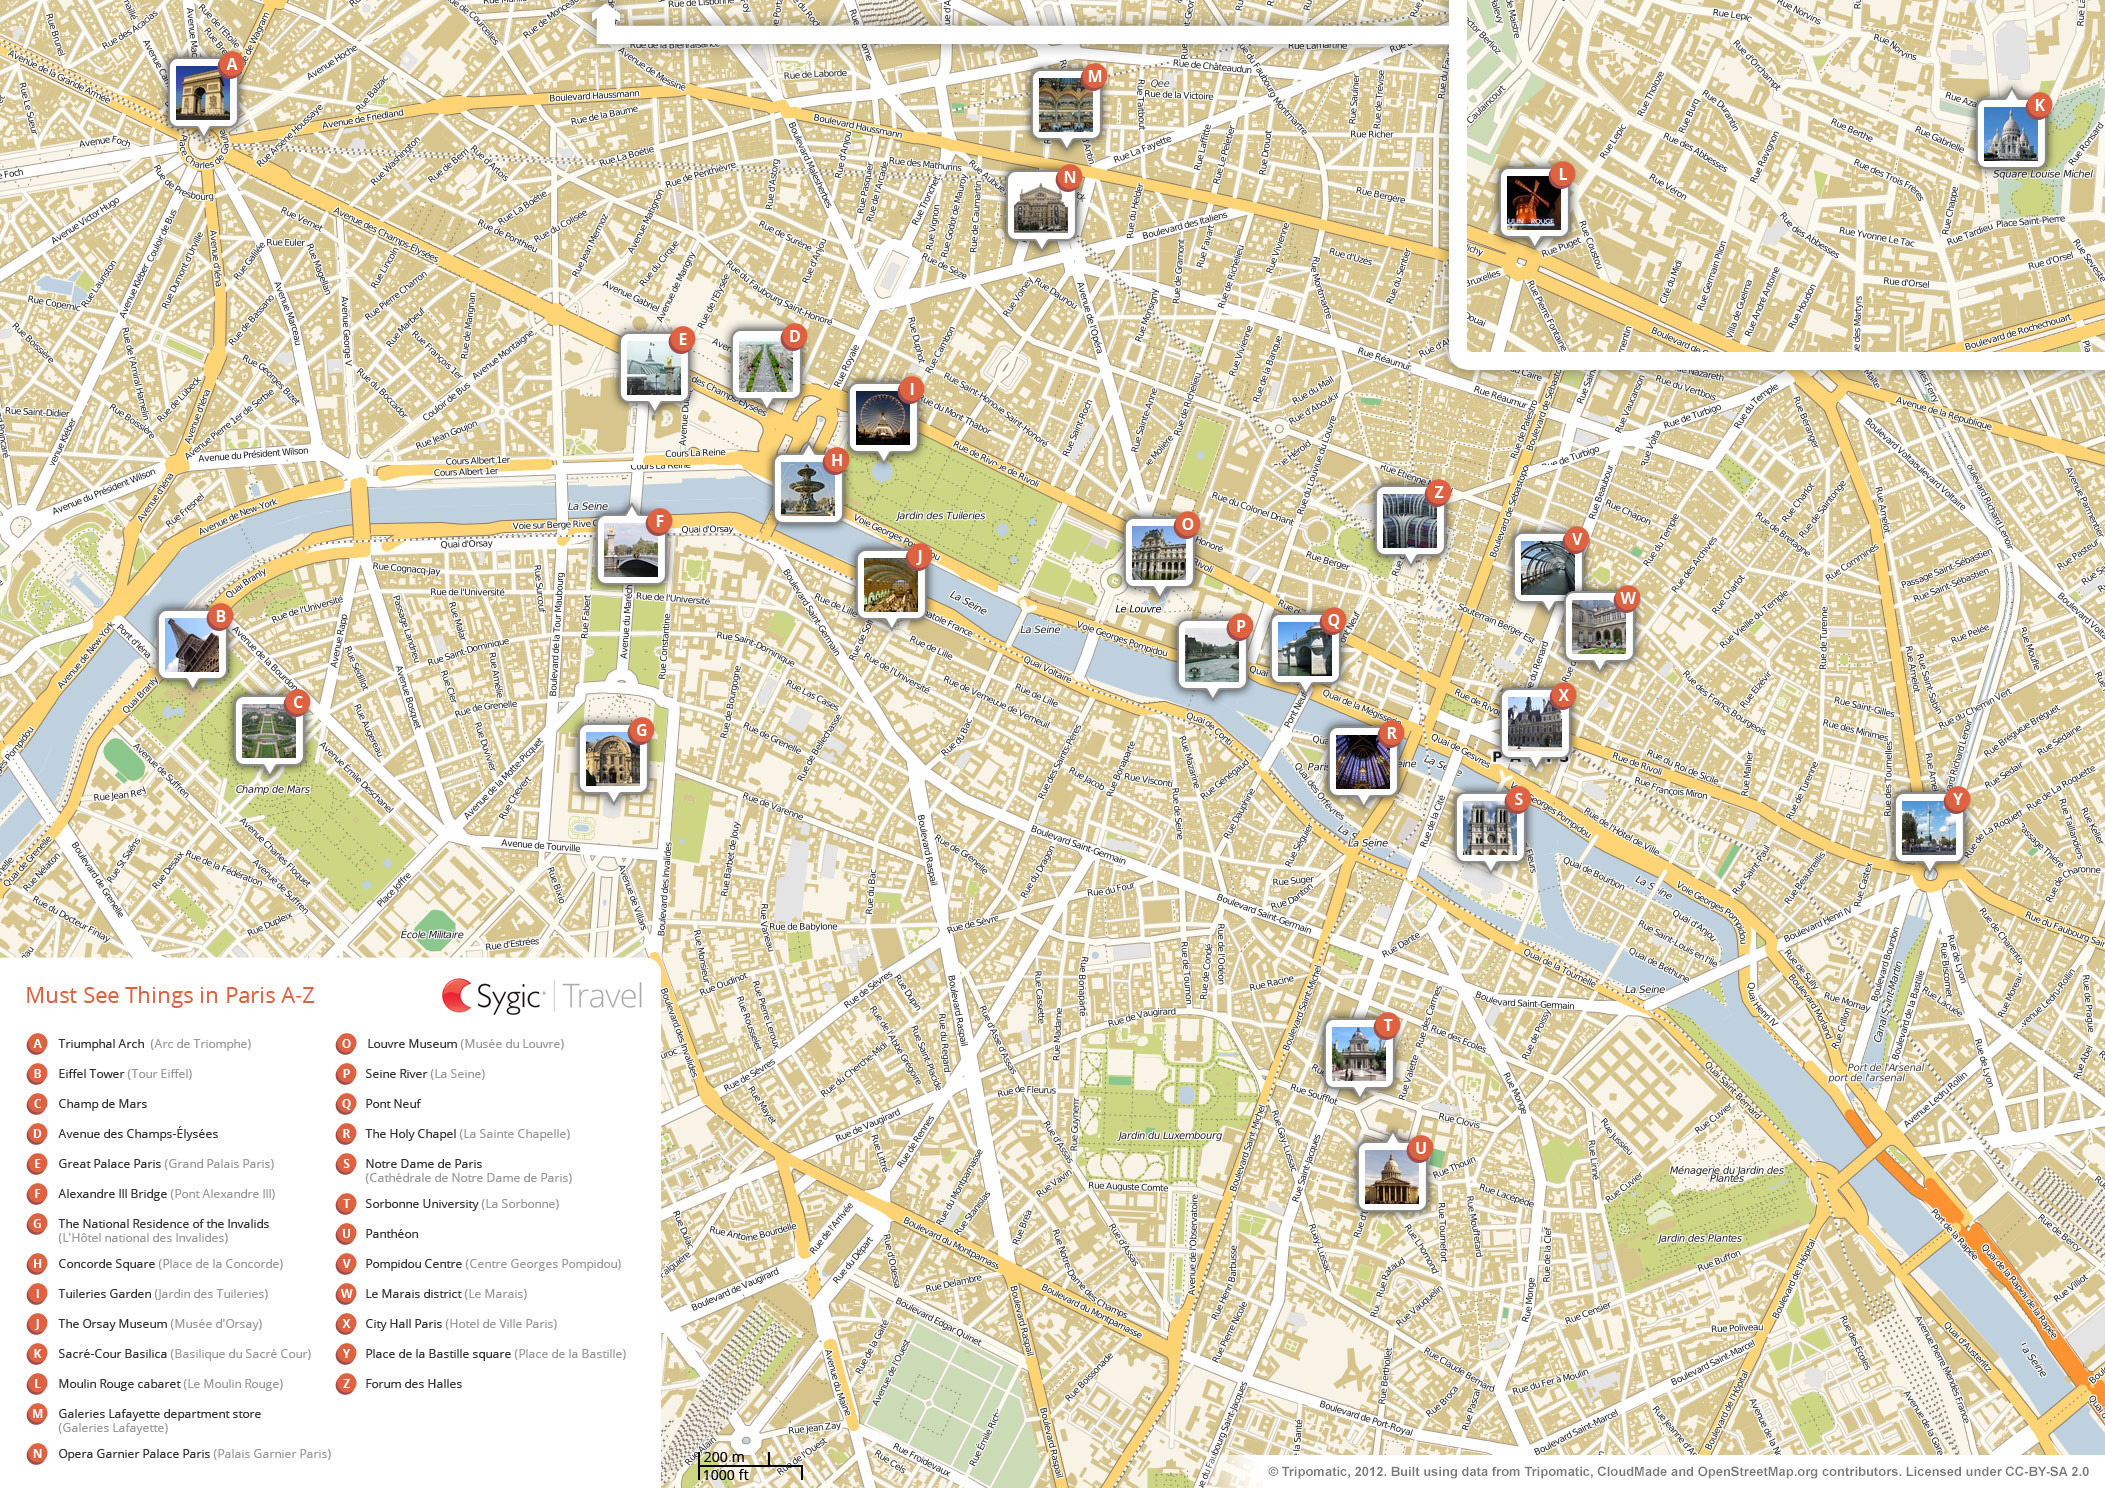 Paris Printable Tourist Map   Sygic Travel - Paris Street Map Printable